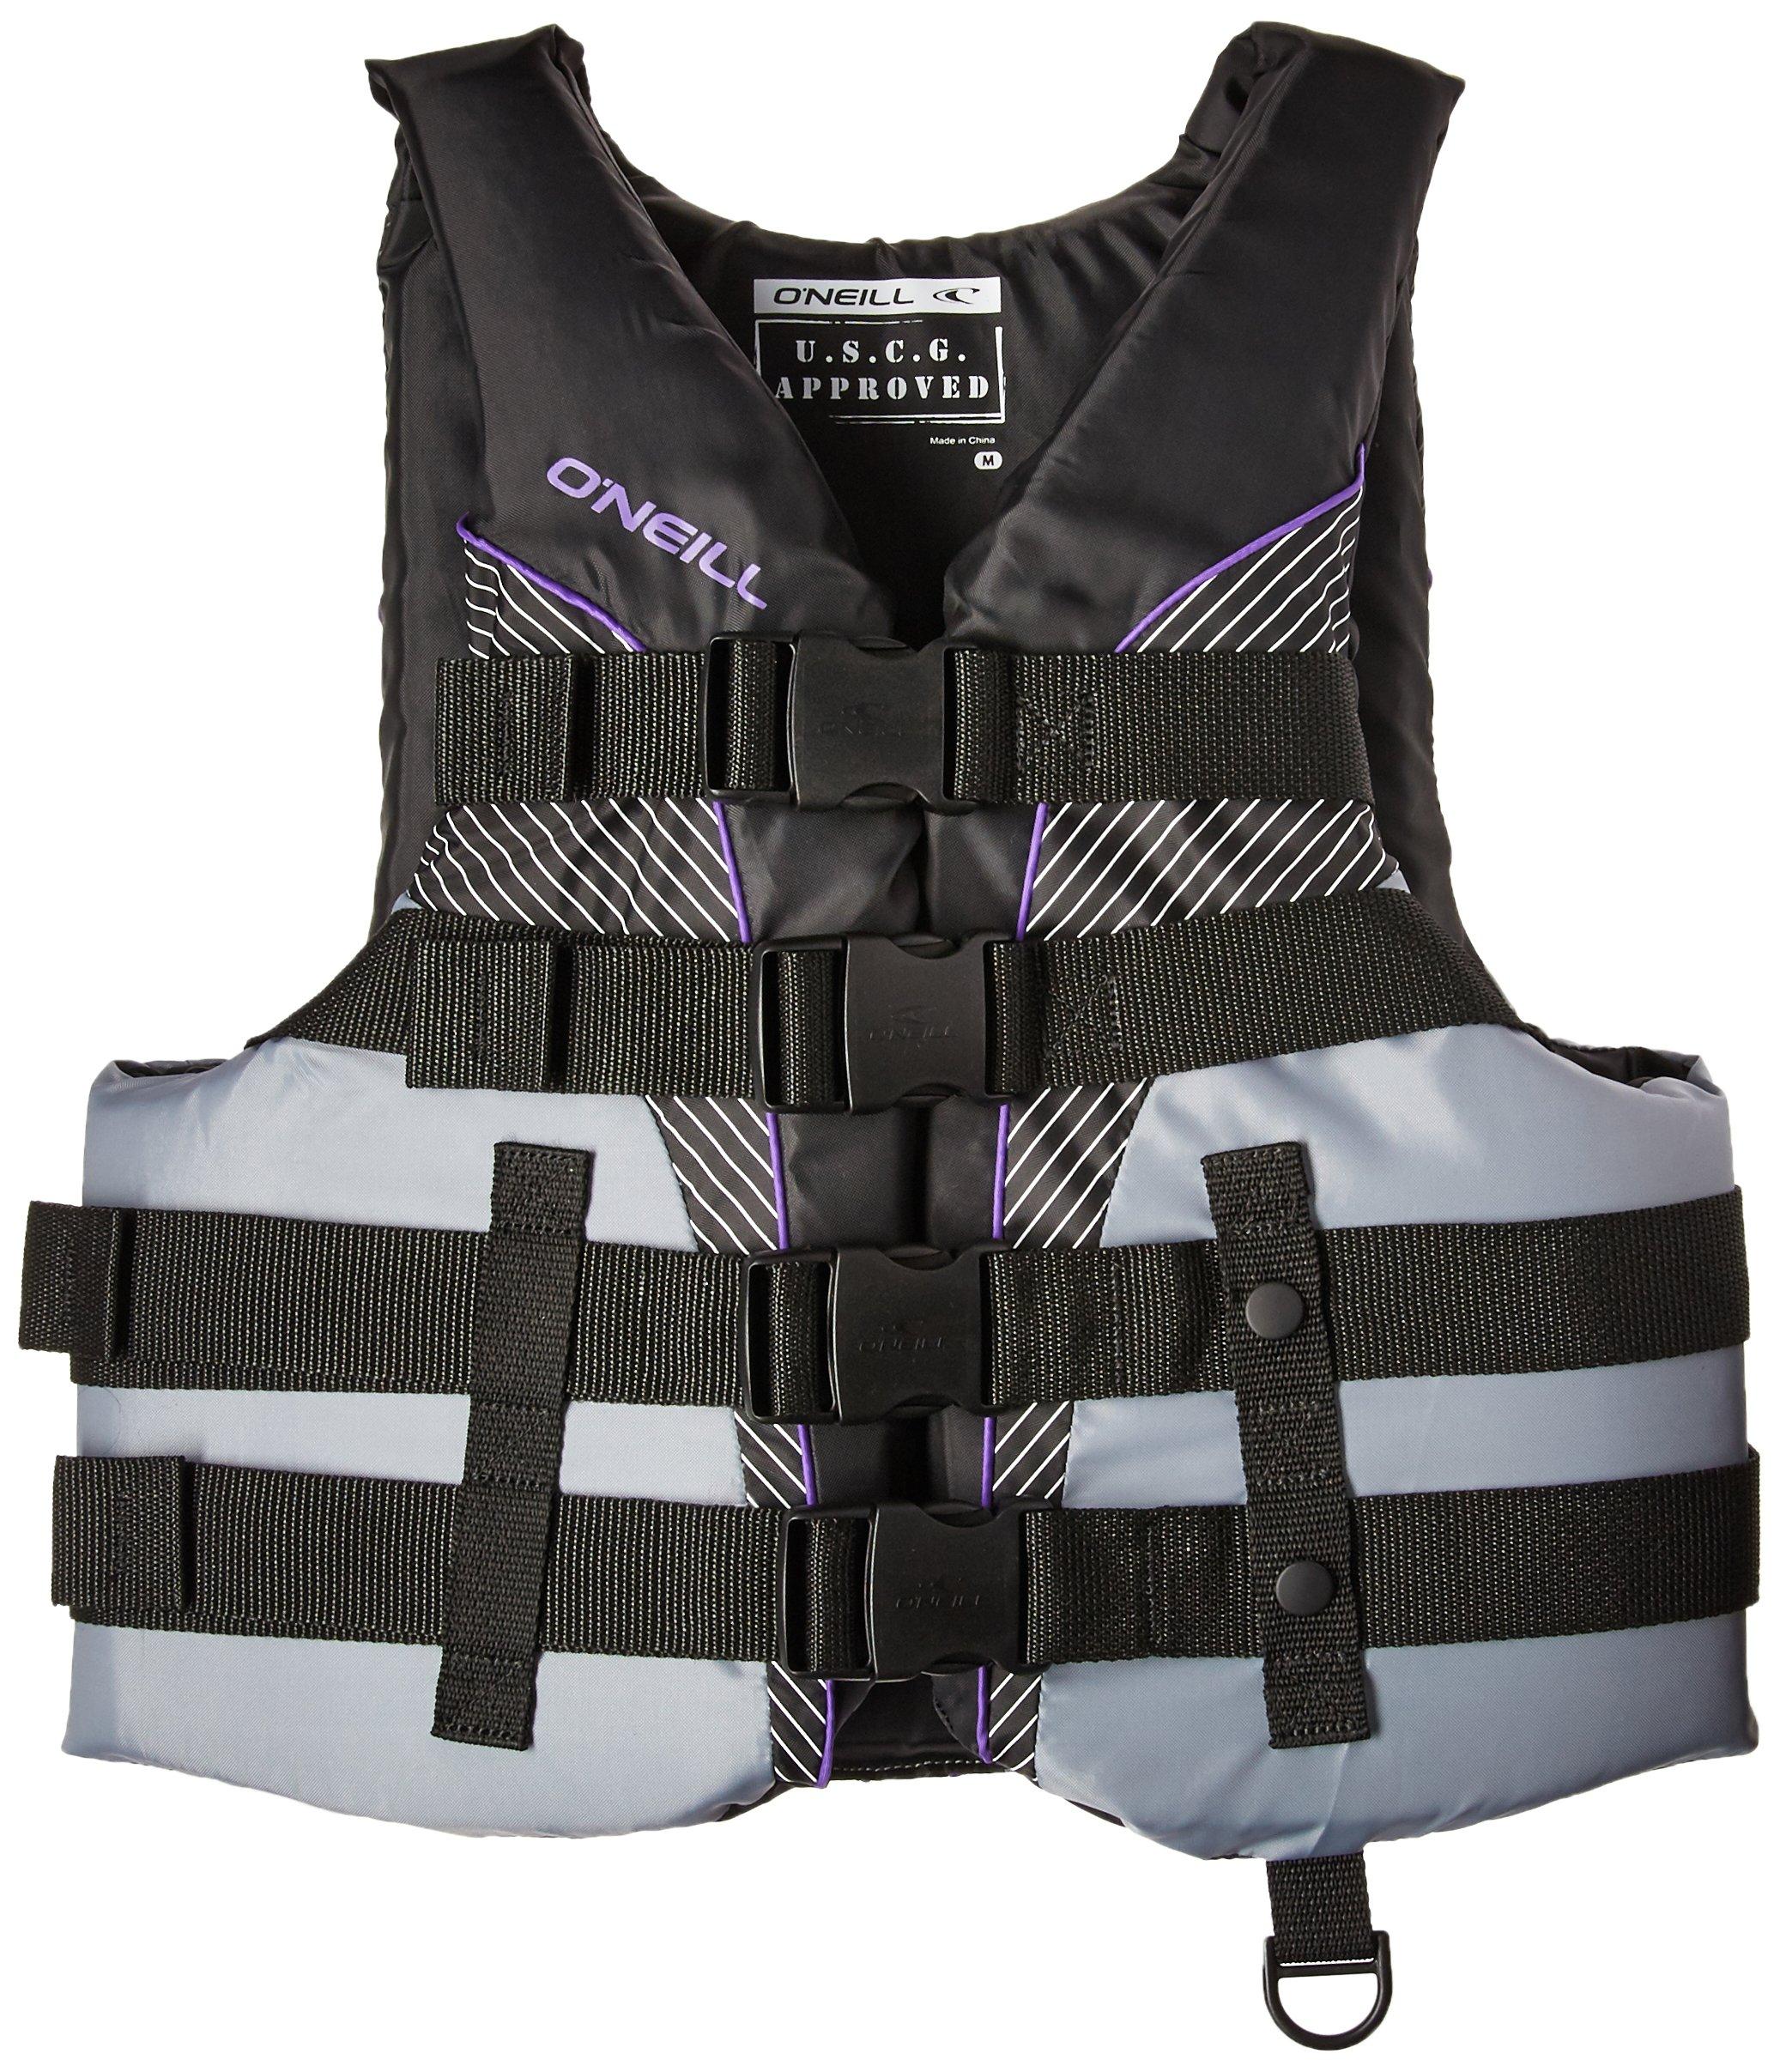 O'Neill   Women's SuperLite USCG Life Vest ,Black/Smoke/Black/UV,Small